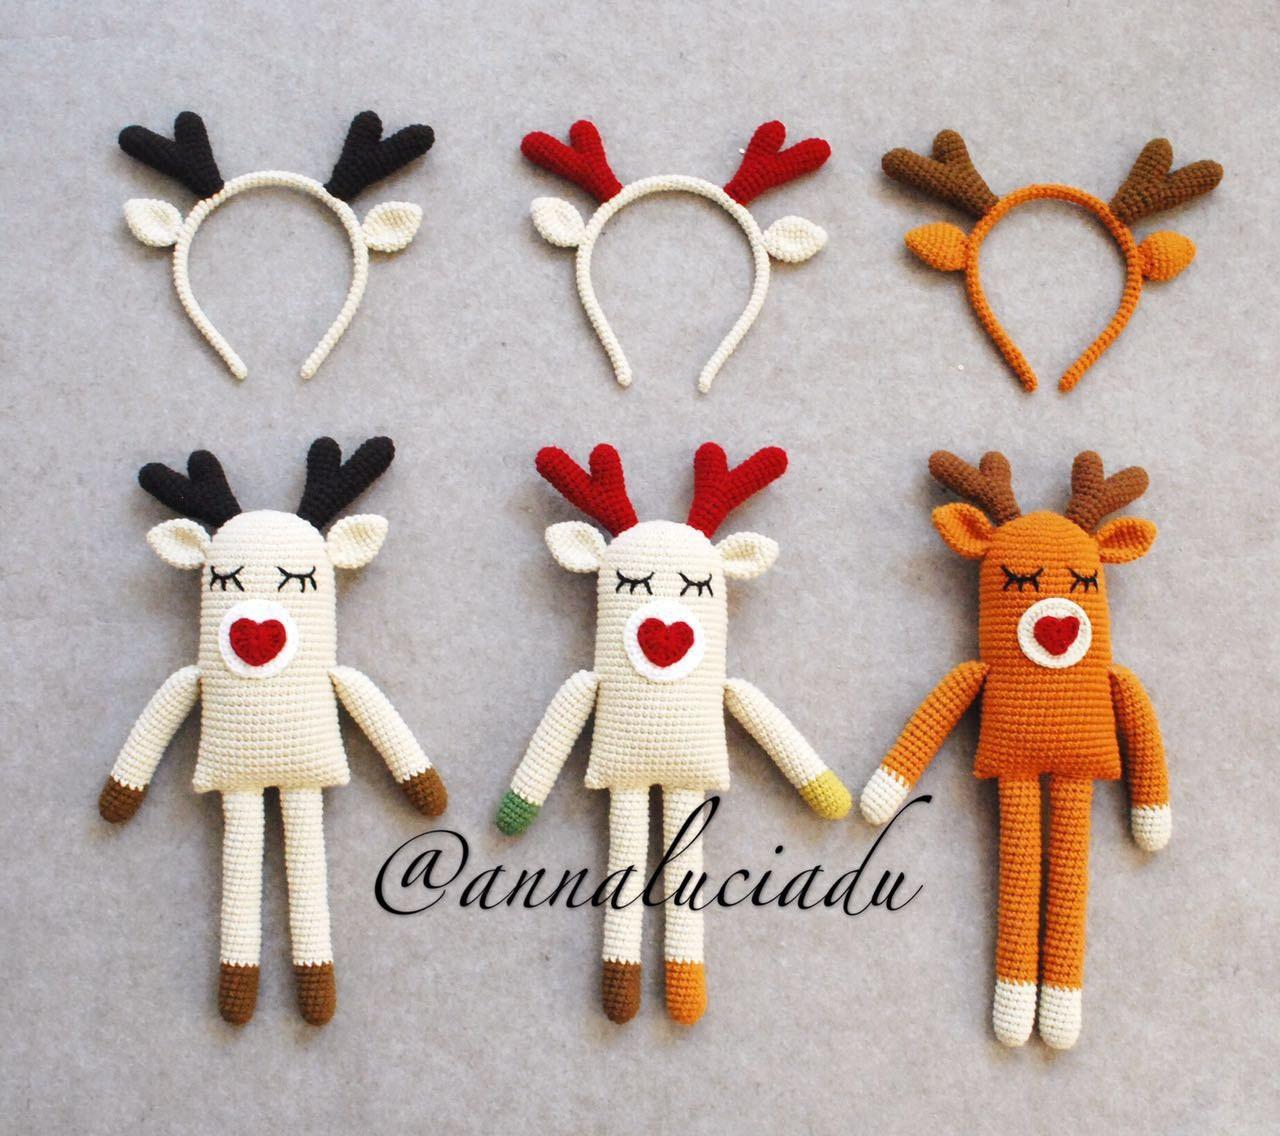 2 pattnens pack(Crochet deer toy and headband) , crochet reindeer ...